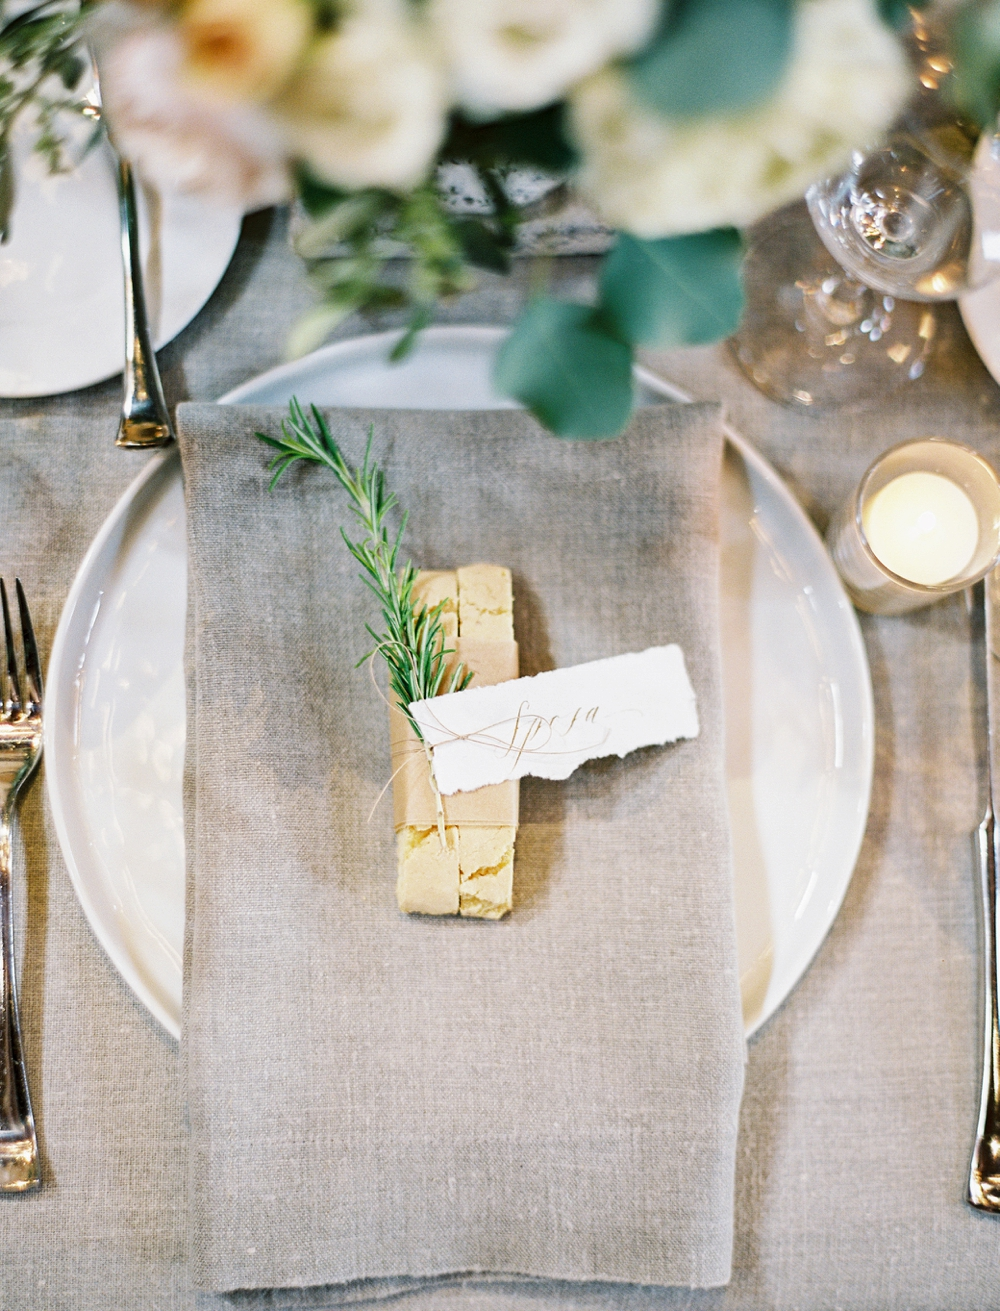 Vicki+Grafton+Photography+-+Fine+Art+Film+Wedding+Photographer+-+Bella+Collina+Wedding_0077.jpg